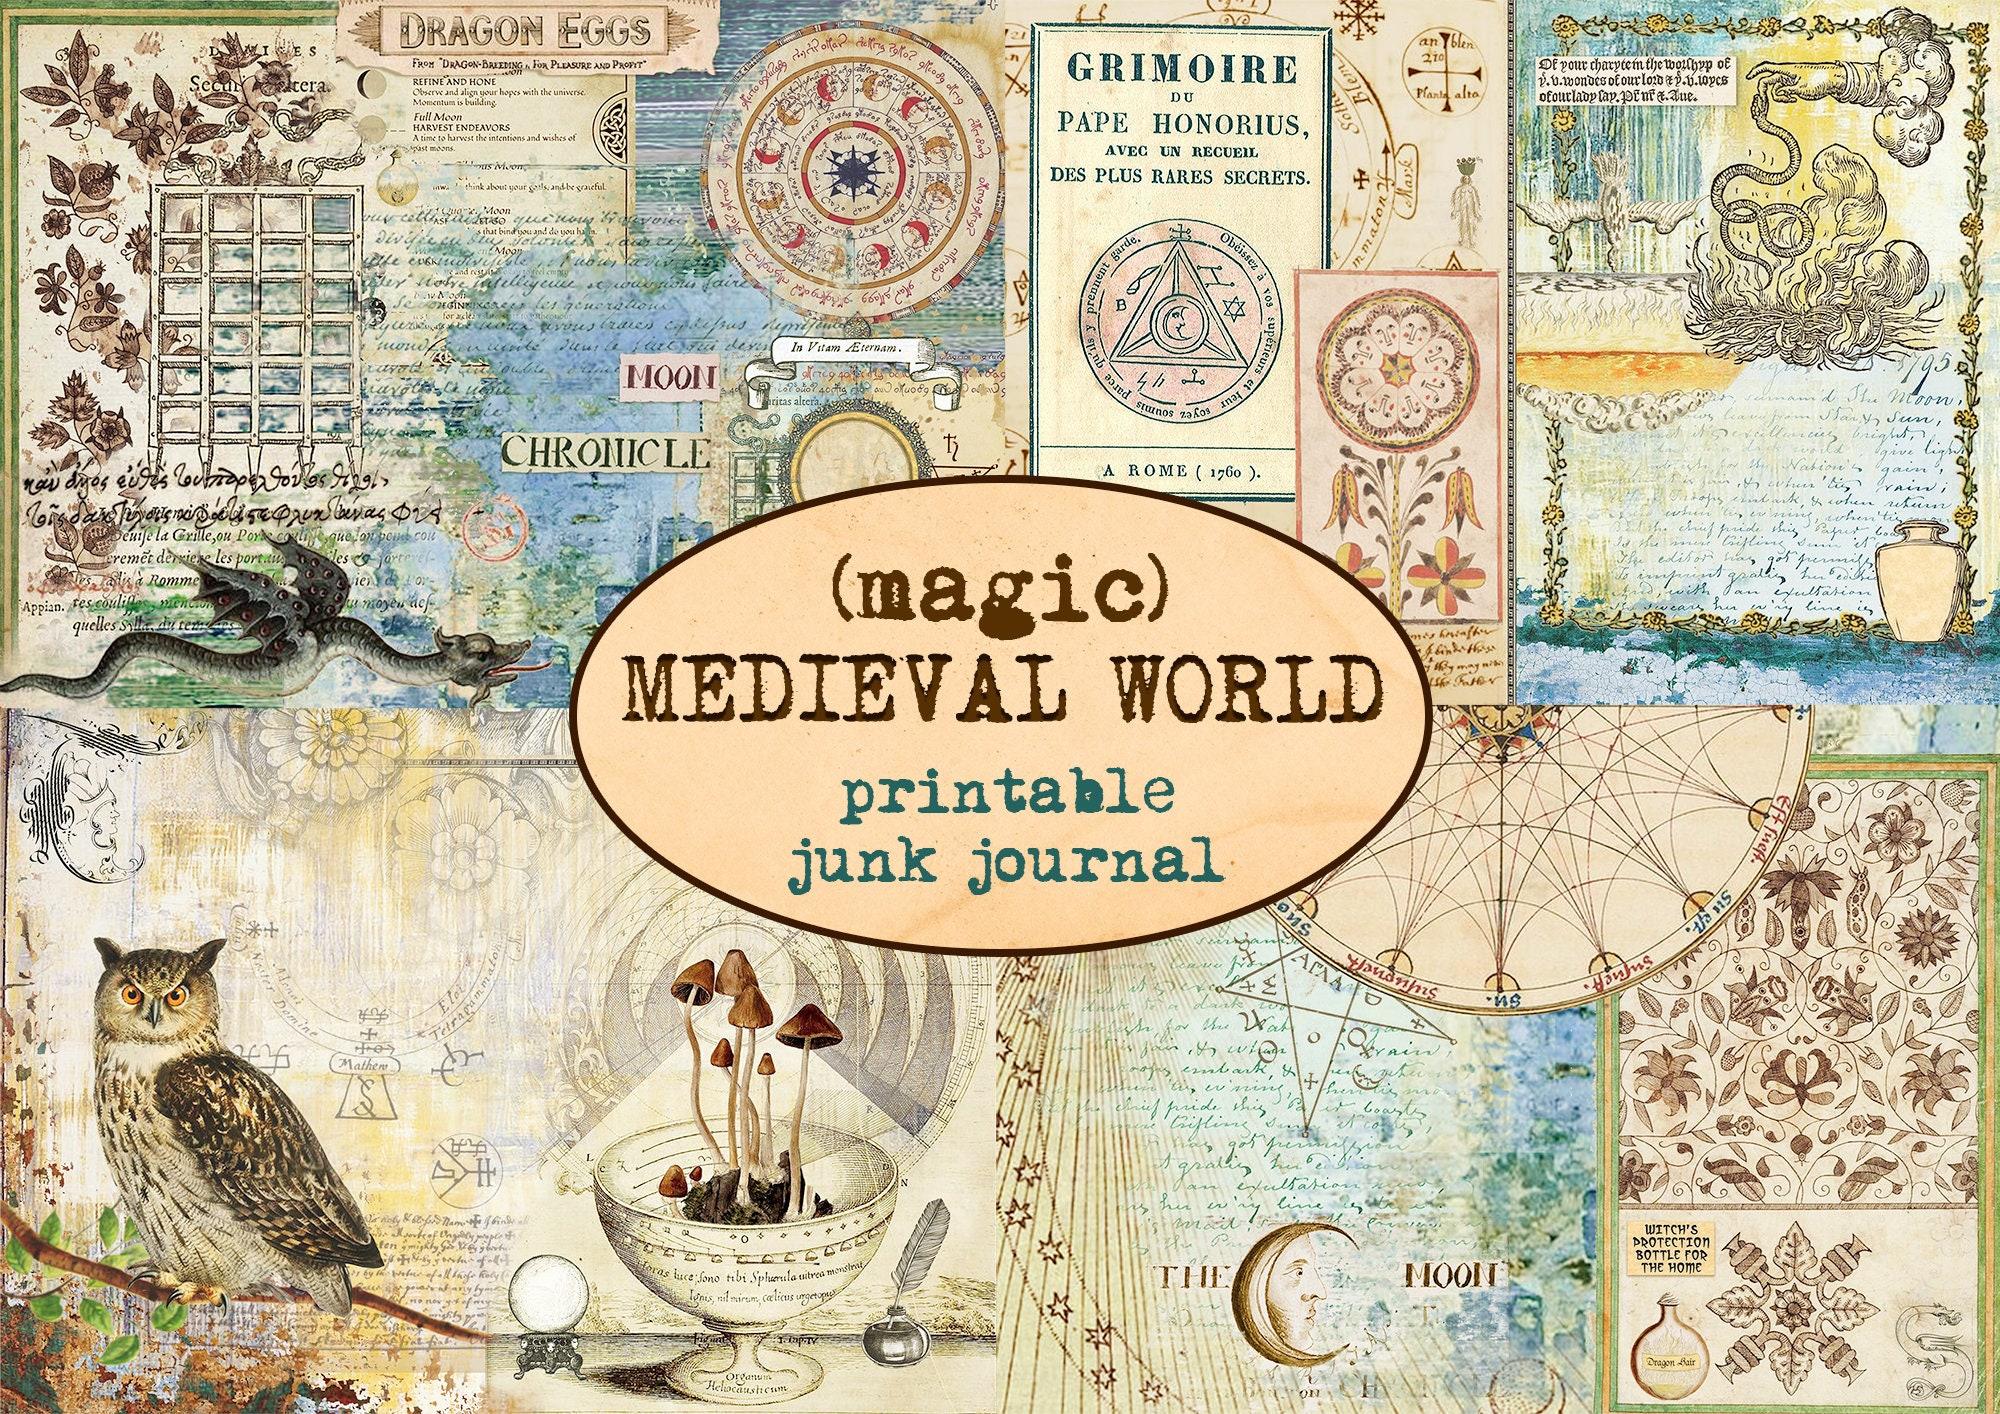 MEDIEVAL MAGIC WORLD printable junk journal / Grimoire journaling kit / Spell book / Ephemera / Mysterious journal/ Scrapbooking paper